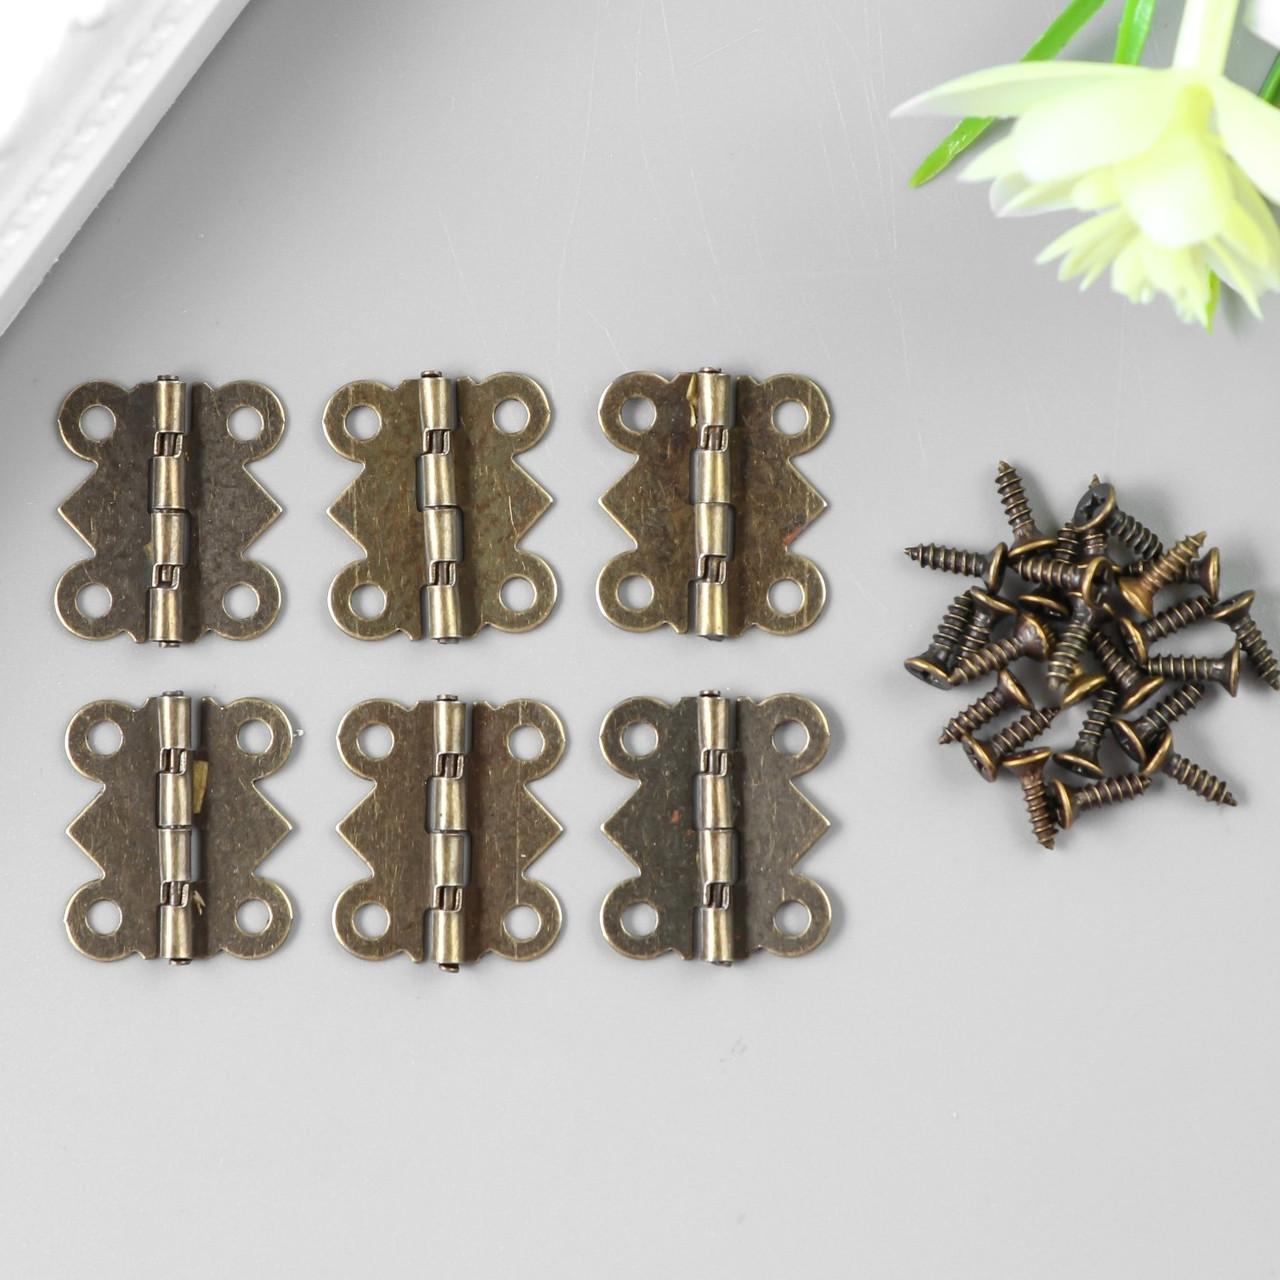 Петля для шкатулки металл фигурная бронза набор 6 шт 1,5х2,1 см